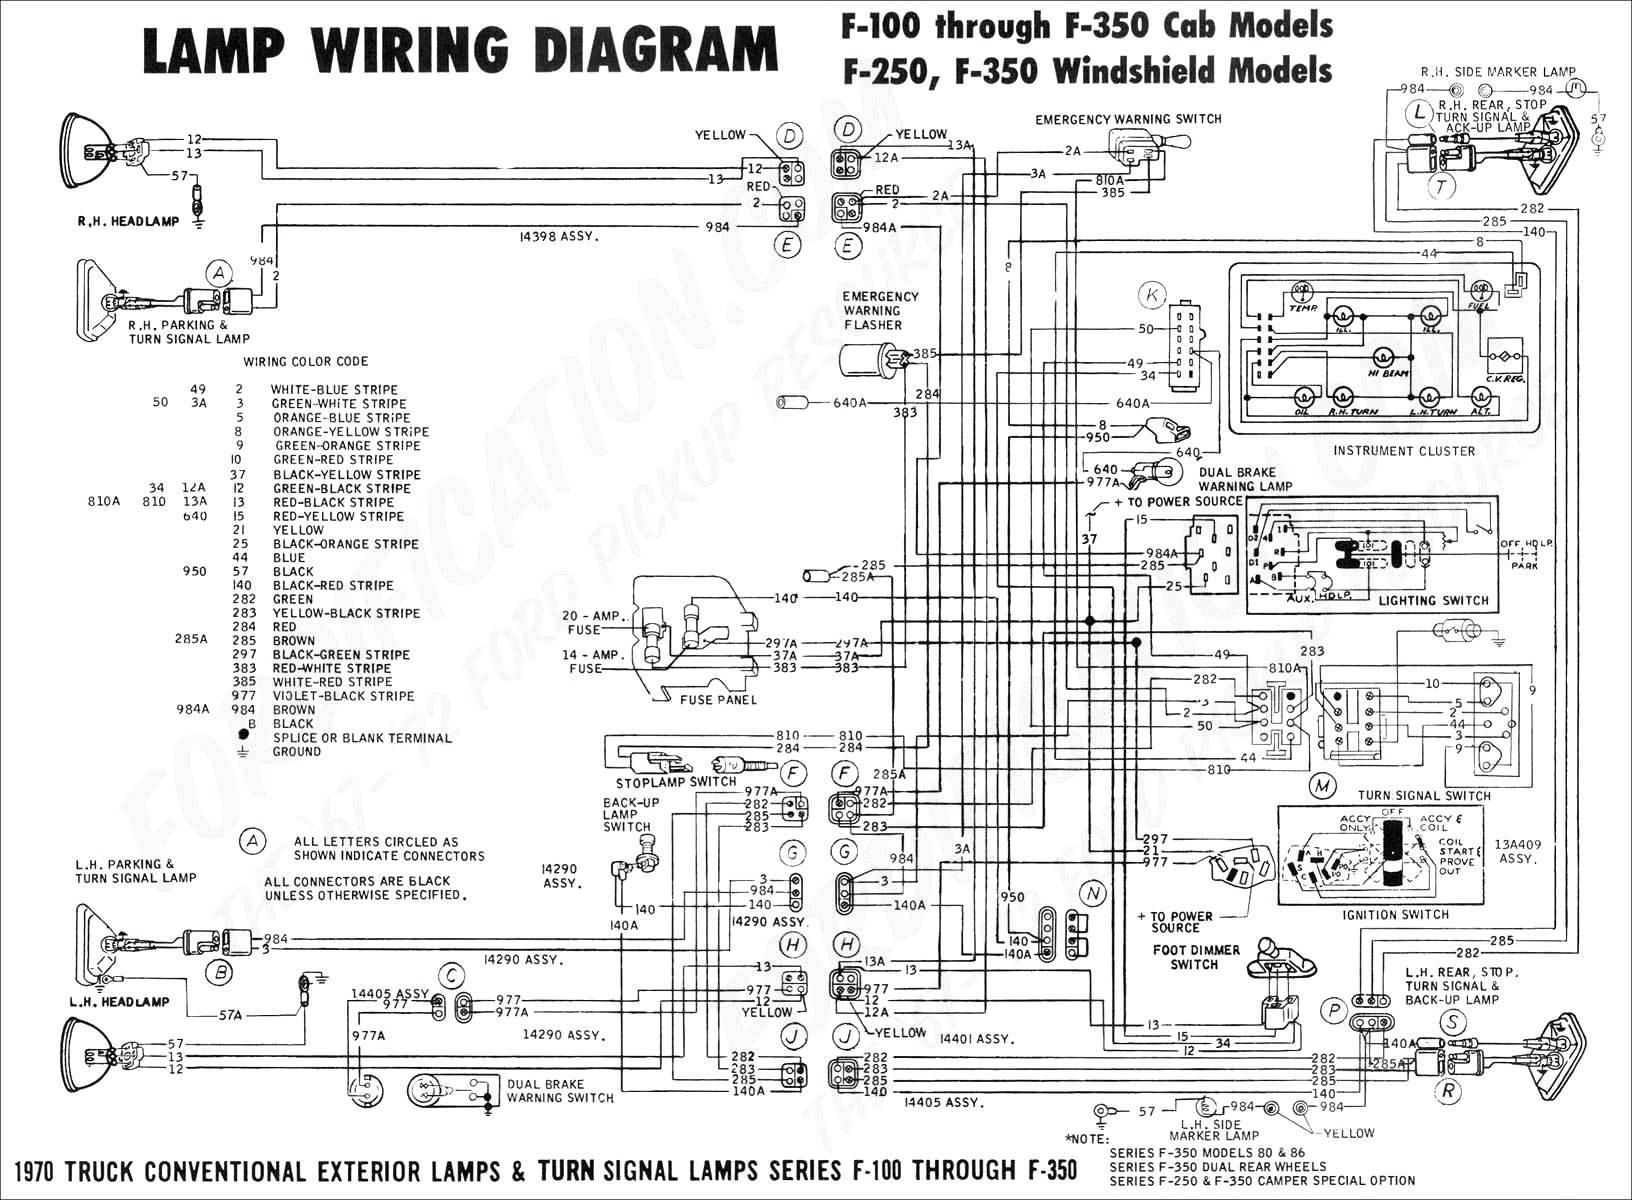 bose earbud wiring diagram Collection-logitech headset usb wiring diagram solved fixya wire center u2022 rh ayseesra co 15-r